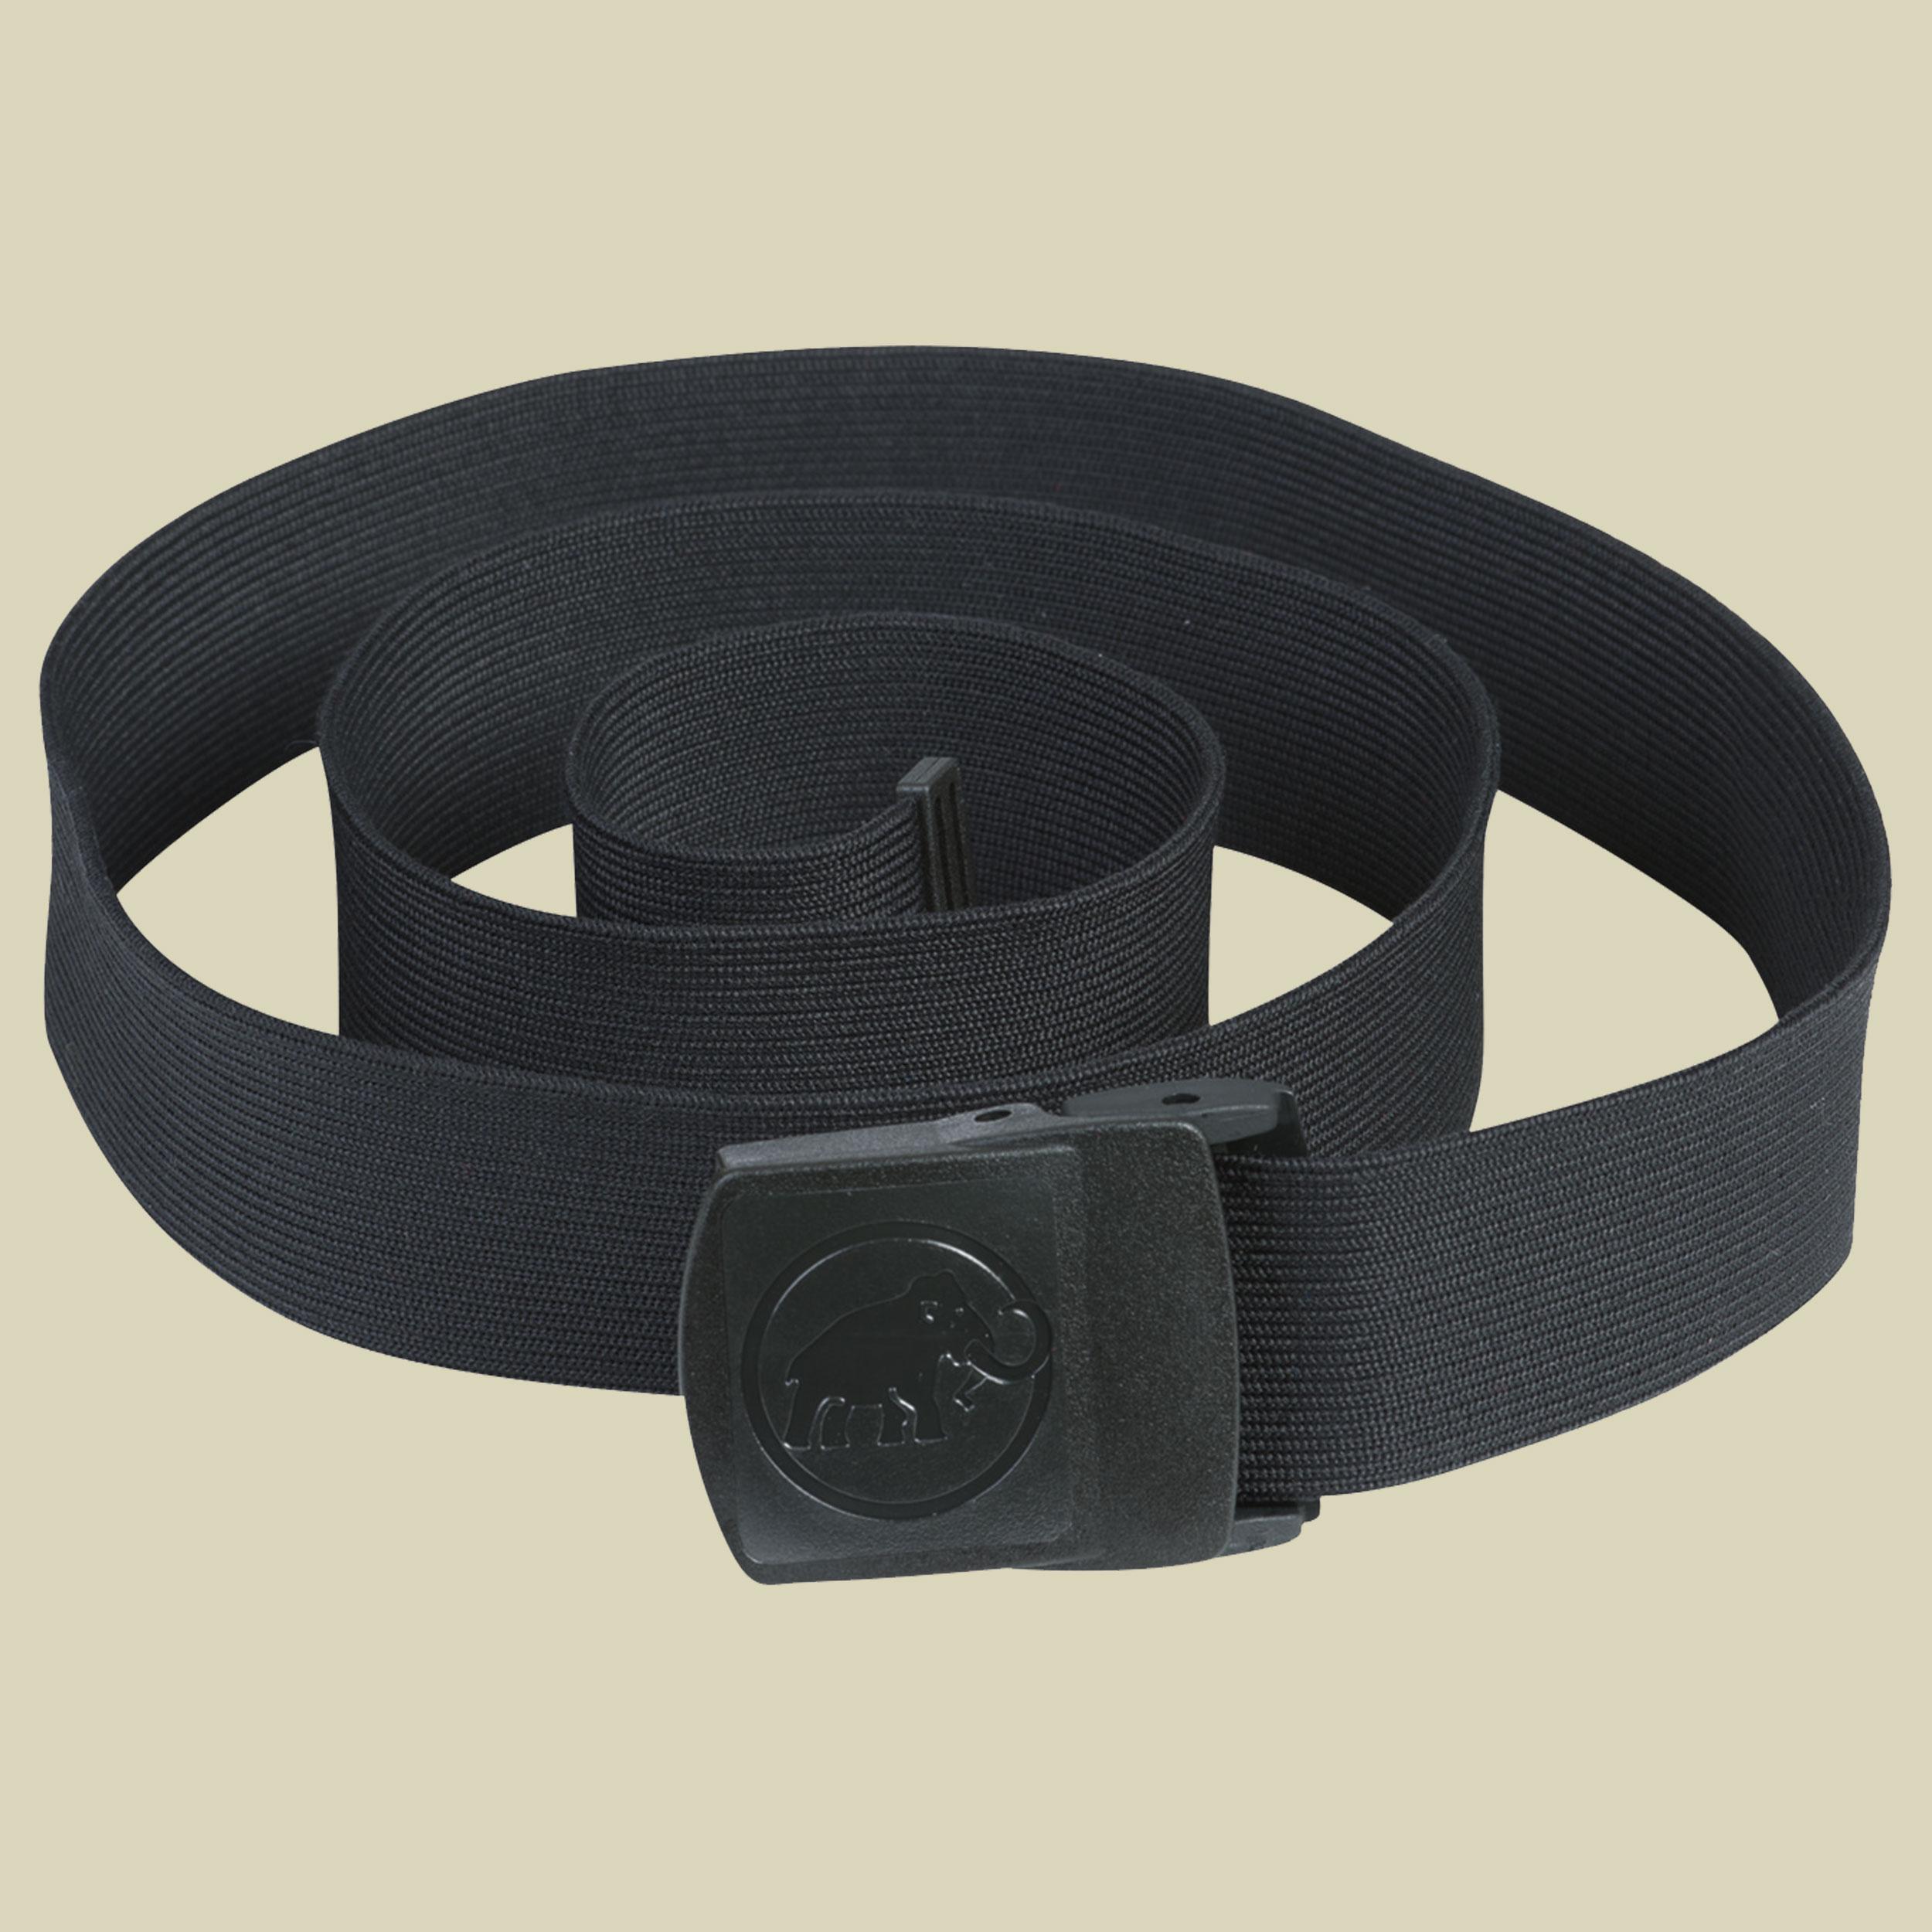 Mammut Alpine Belt Textilgürtel Unisex one size black